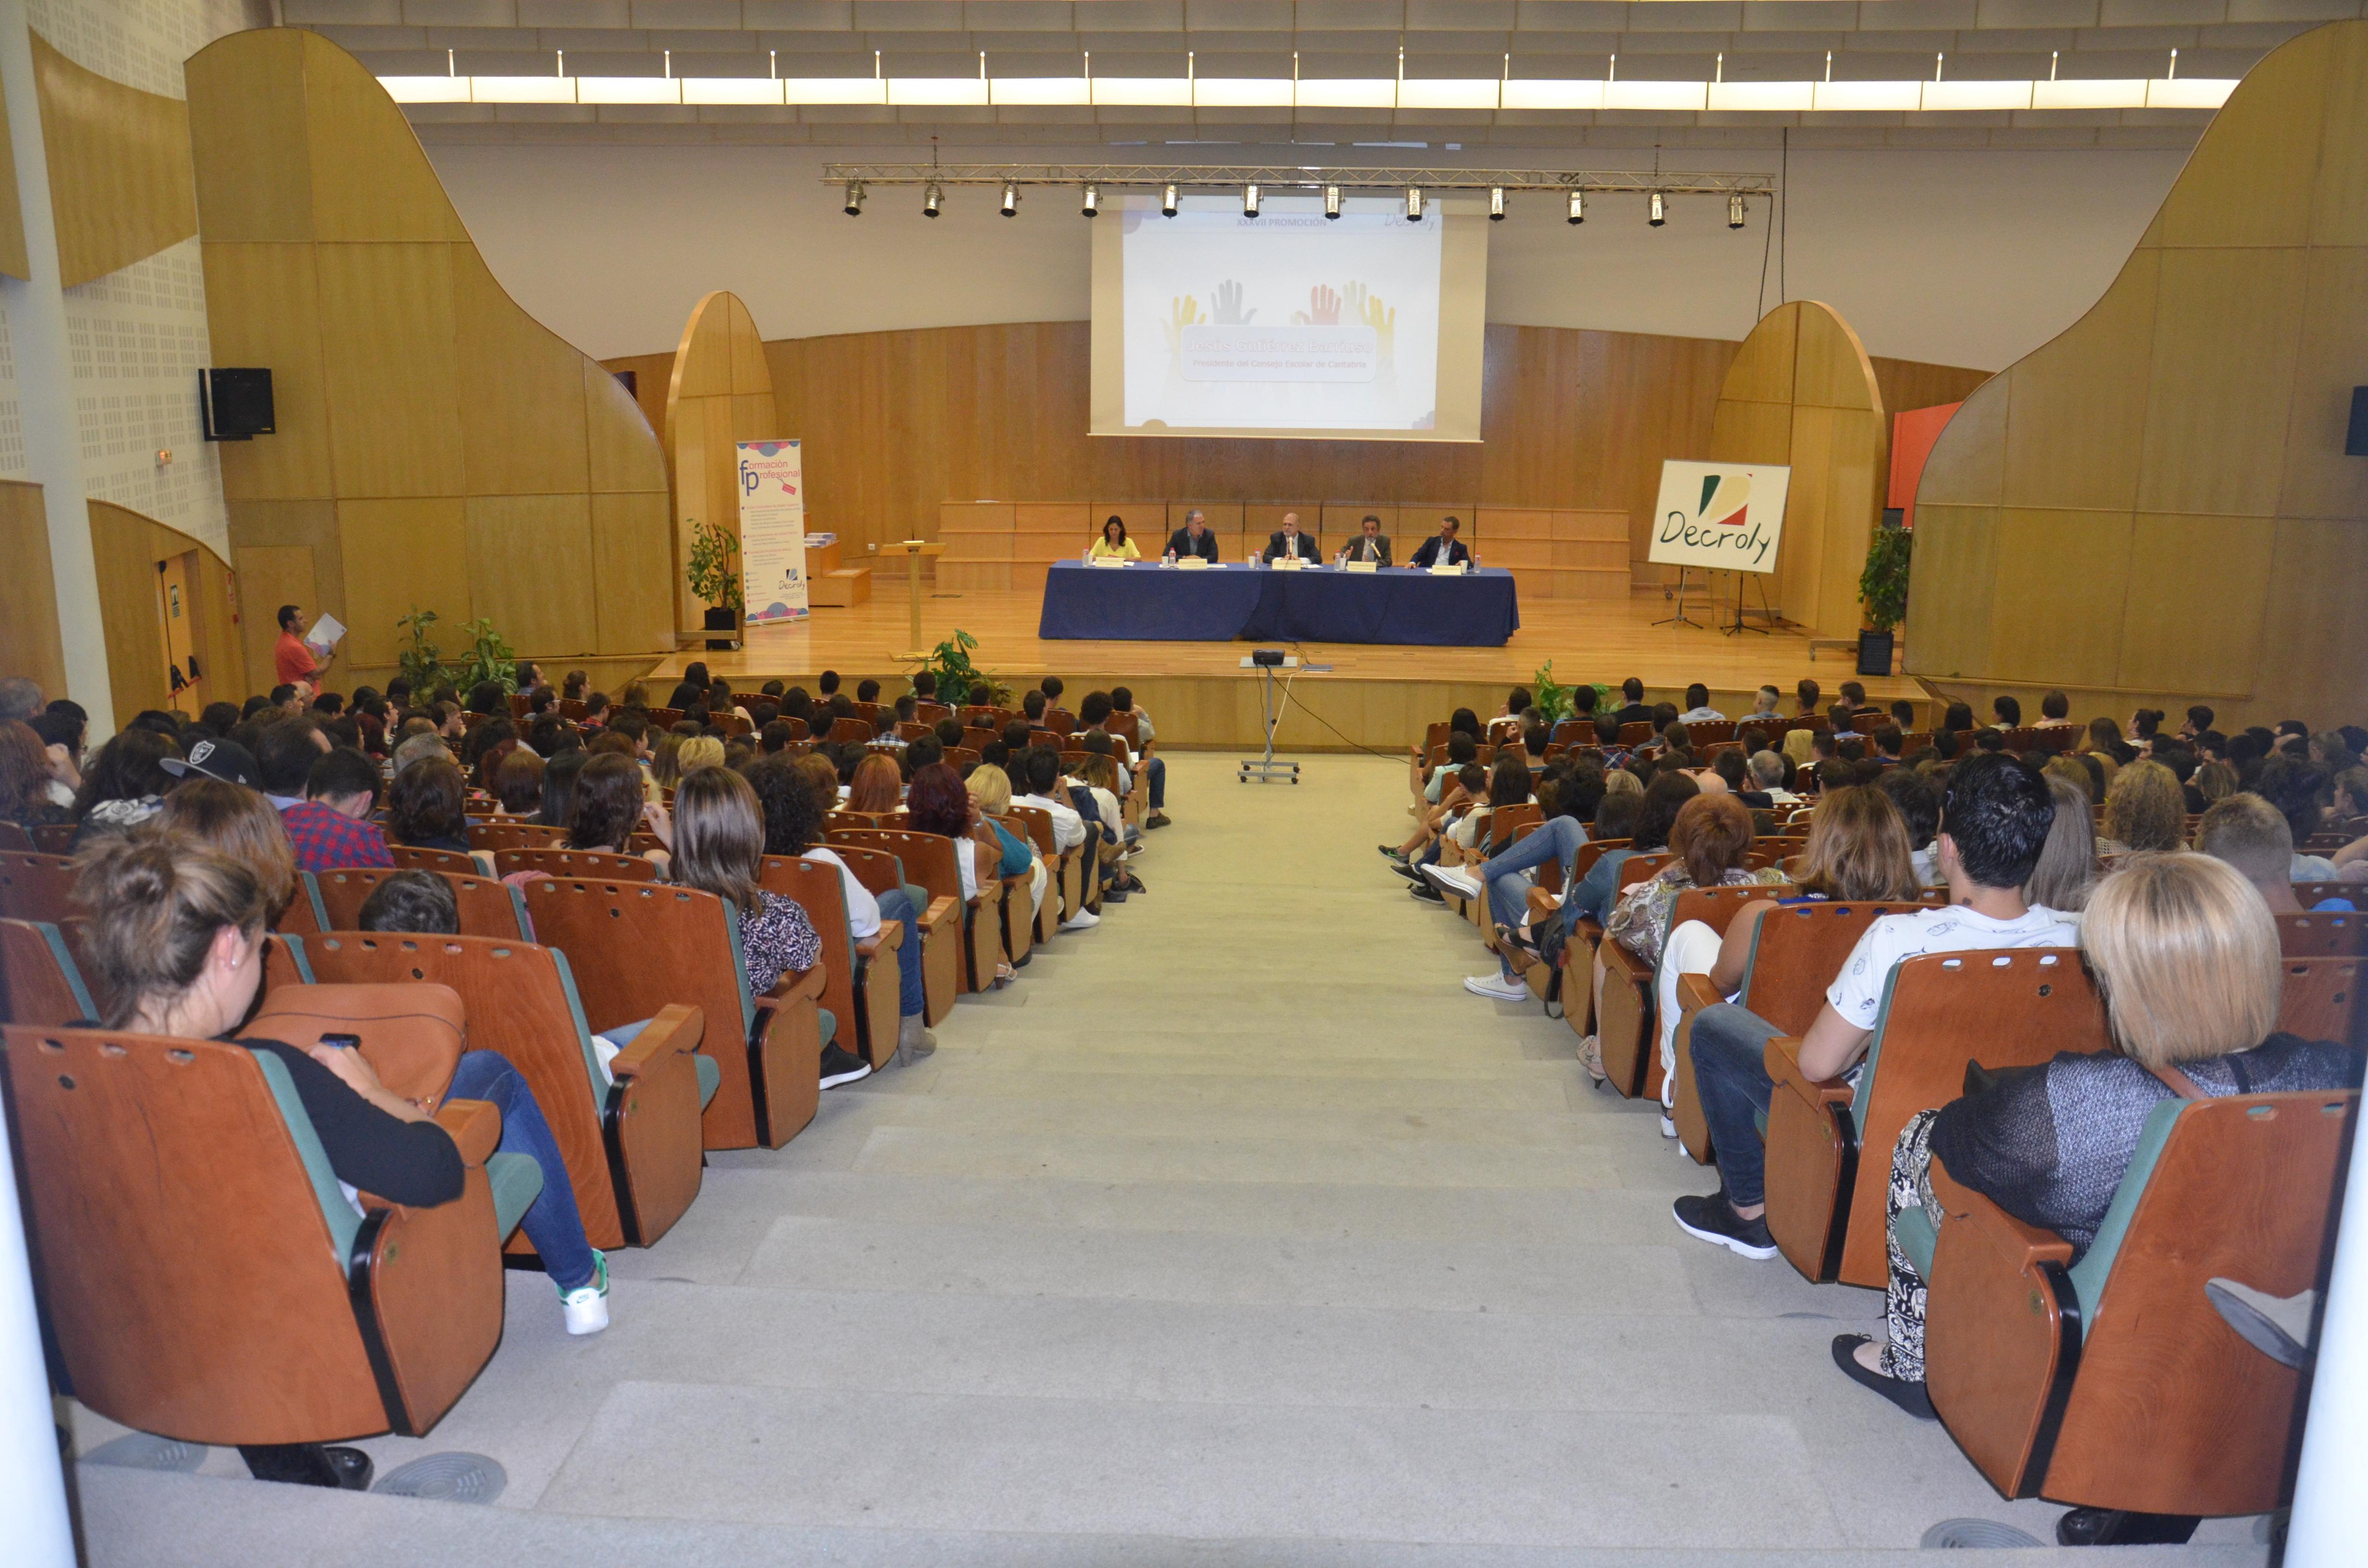 DECROLY - Centro Concertado de Formación Profesional en Santander | Jiménez Díaz 5, 39007 Santander (Cantabria) | +34 942 375 708